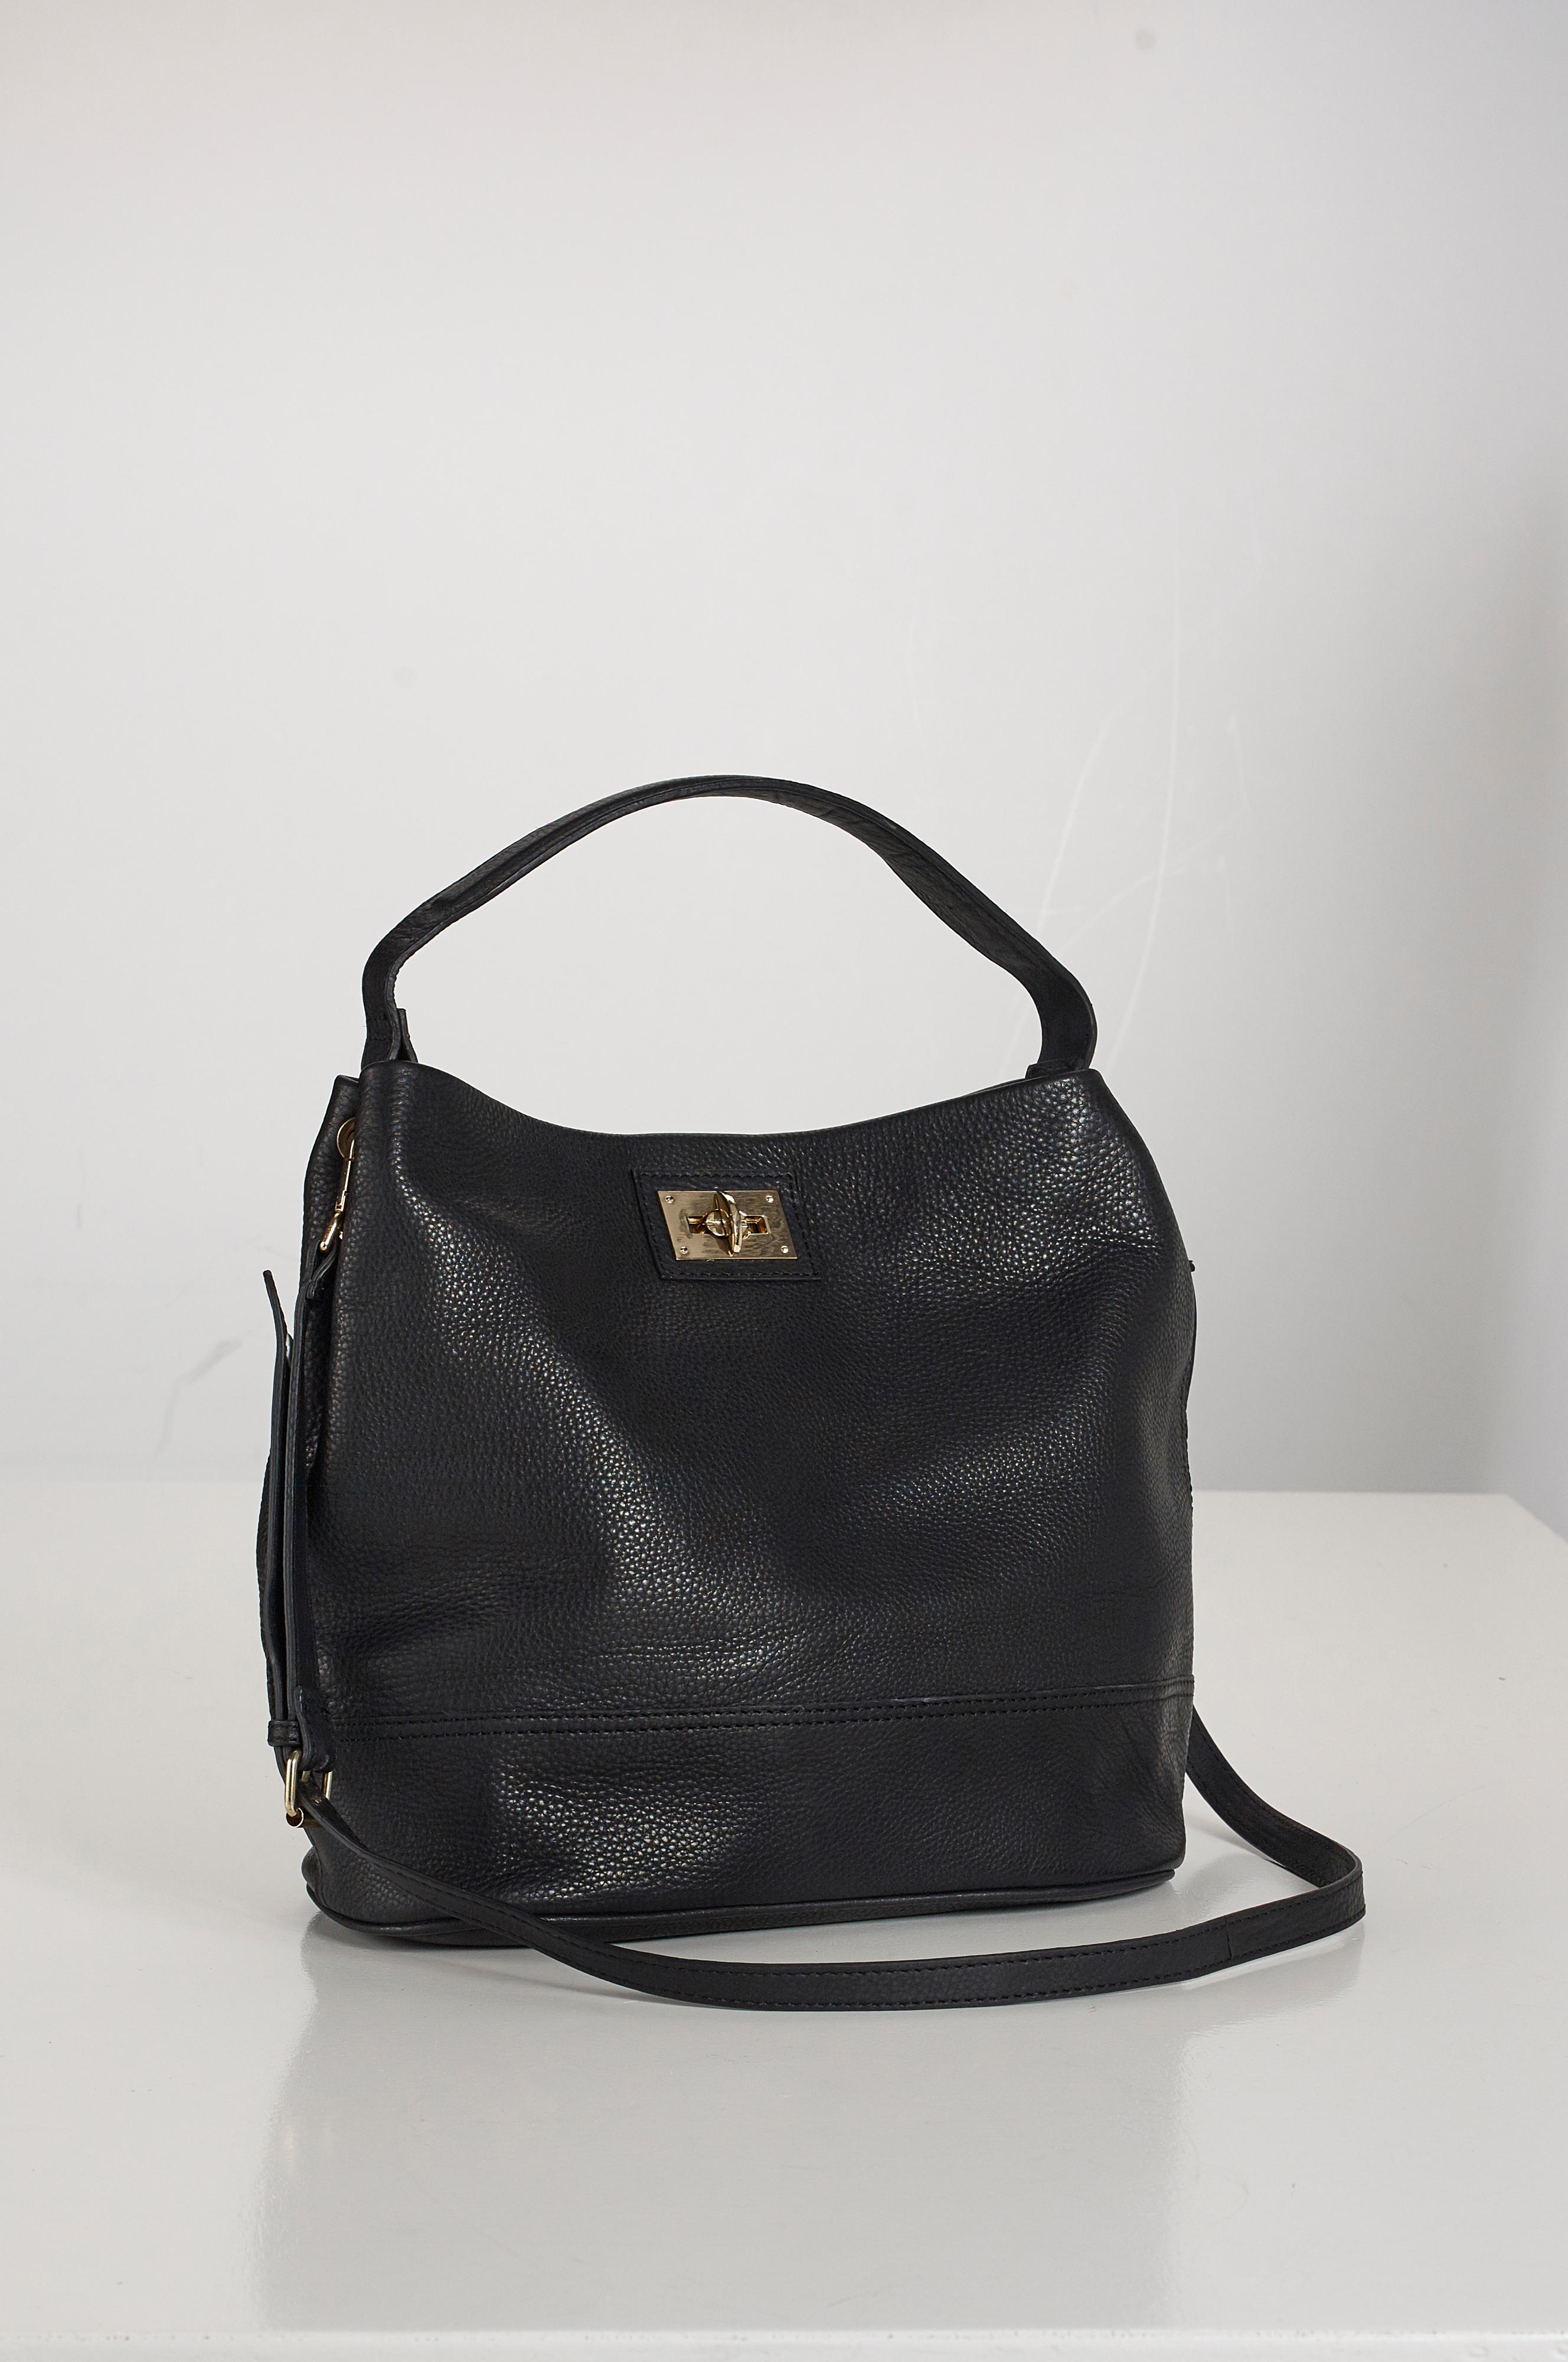 svart skinnväska finns på PricePi.com. aeb154f9972ea